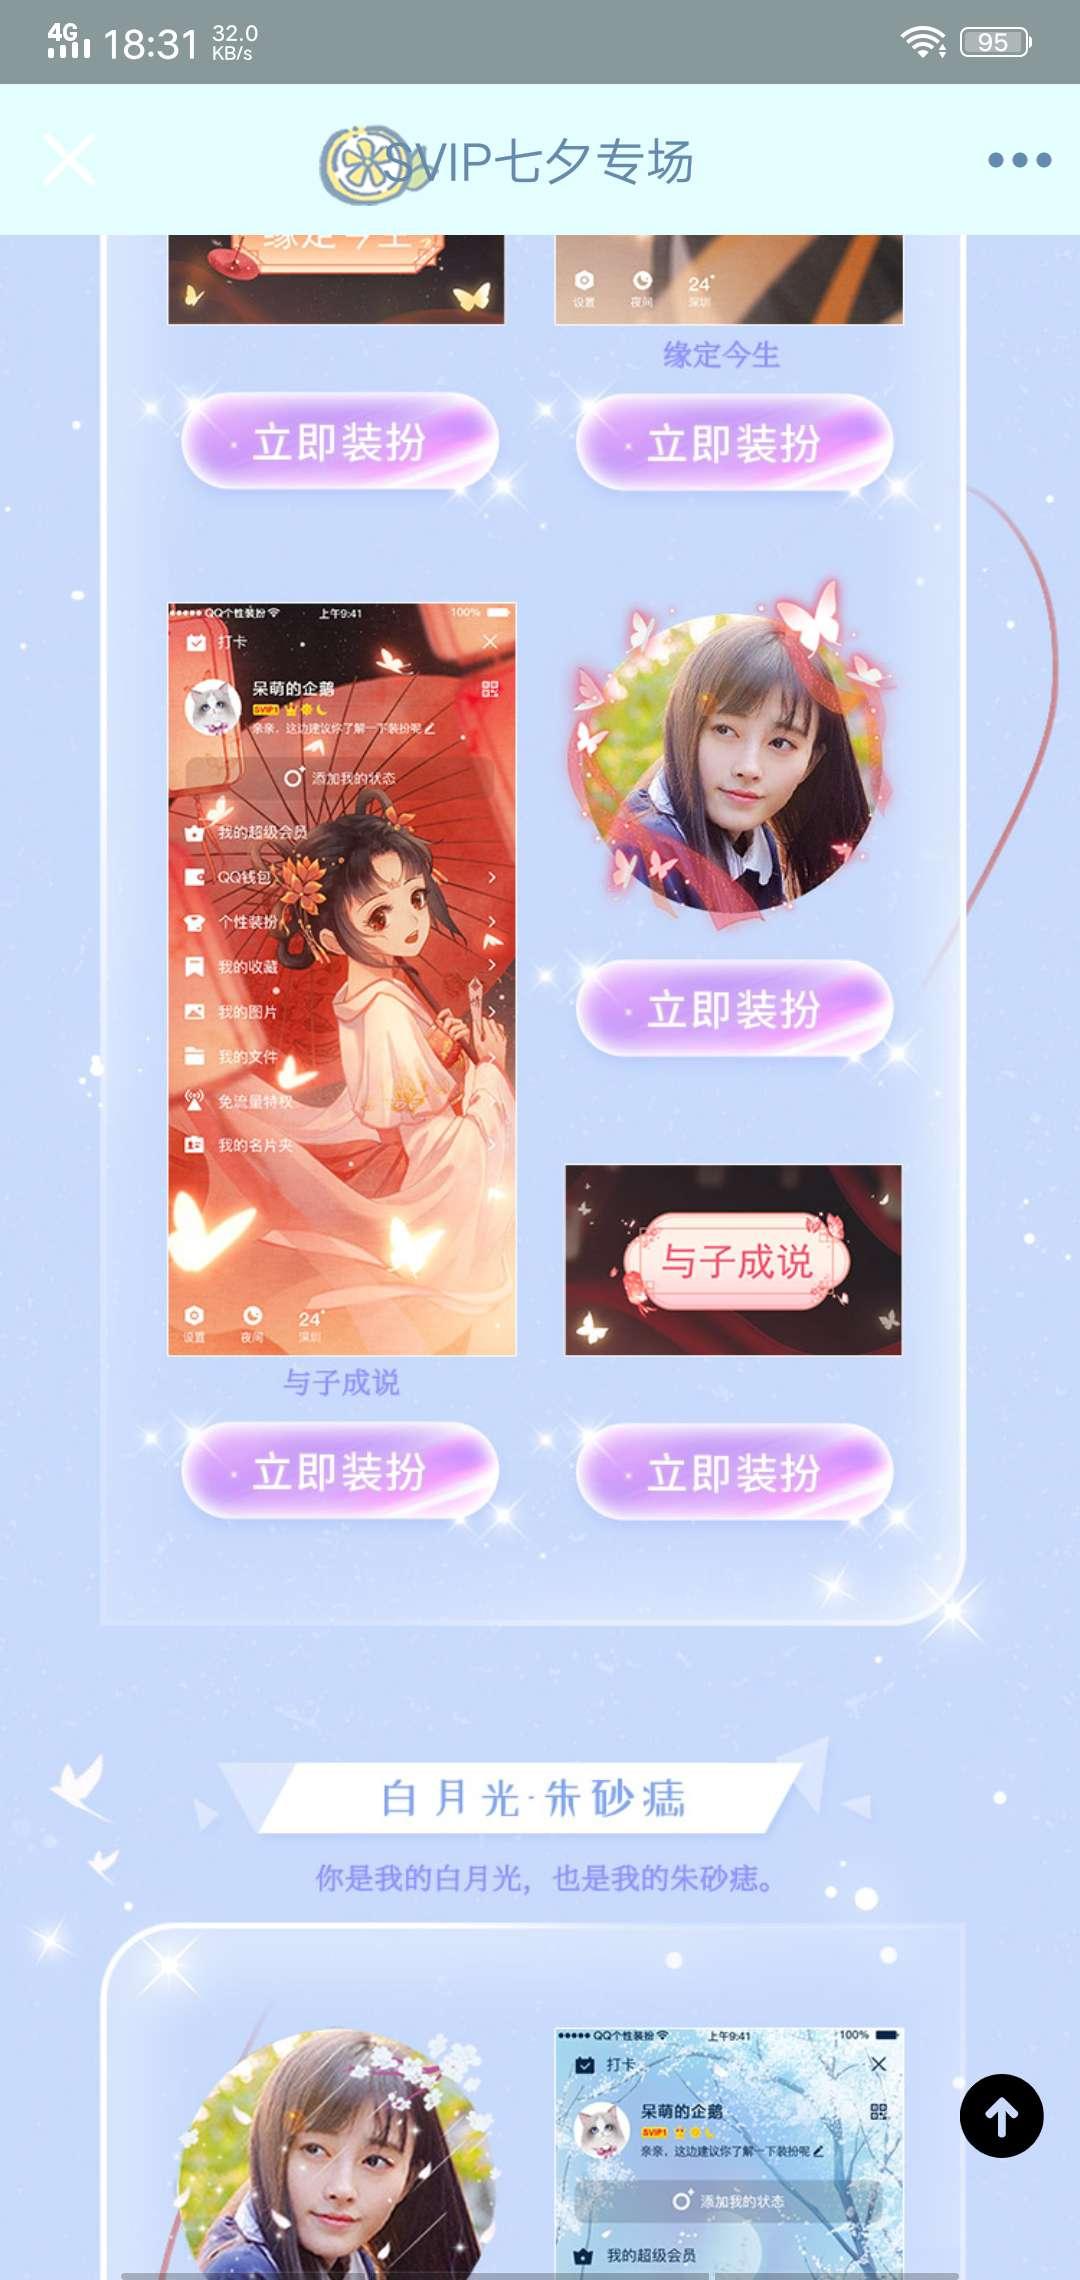 QQ超会免费领七夕装扮插图3